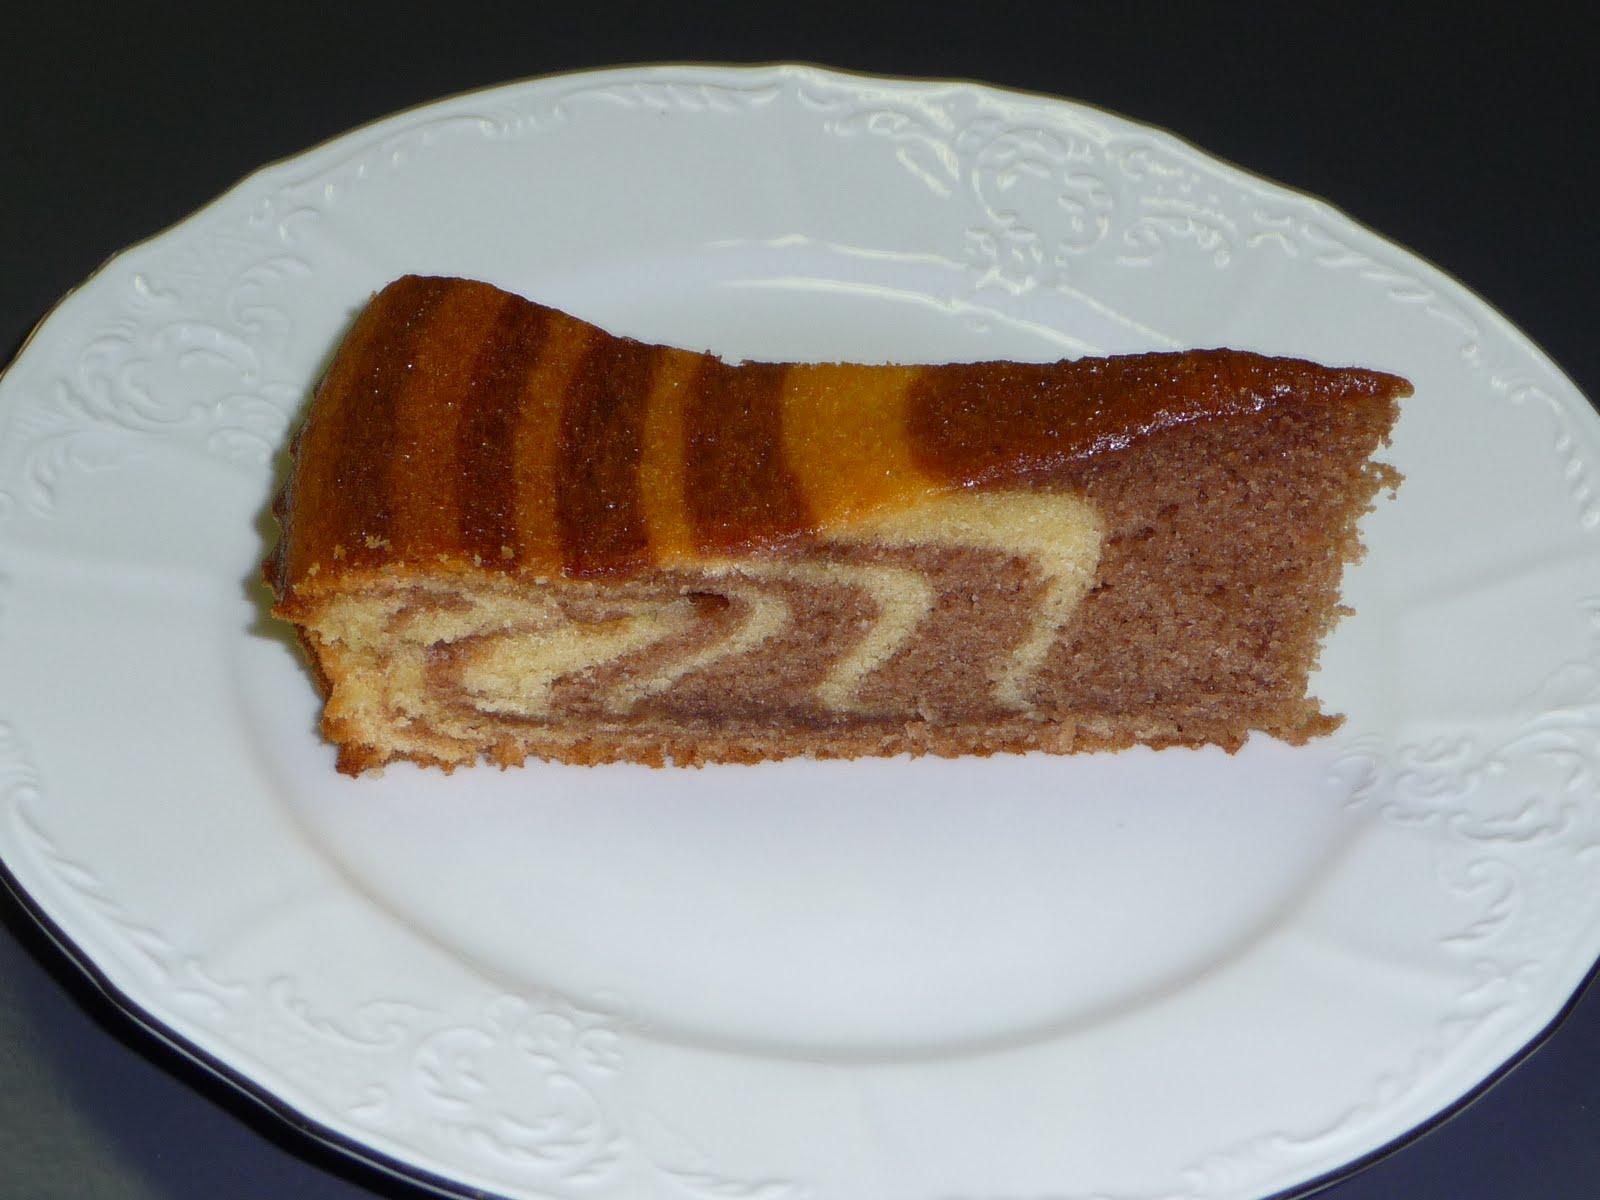 Le ricette di nadia torta zebrata di benedetta parodi for Le ricette di benedetta parodi